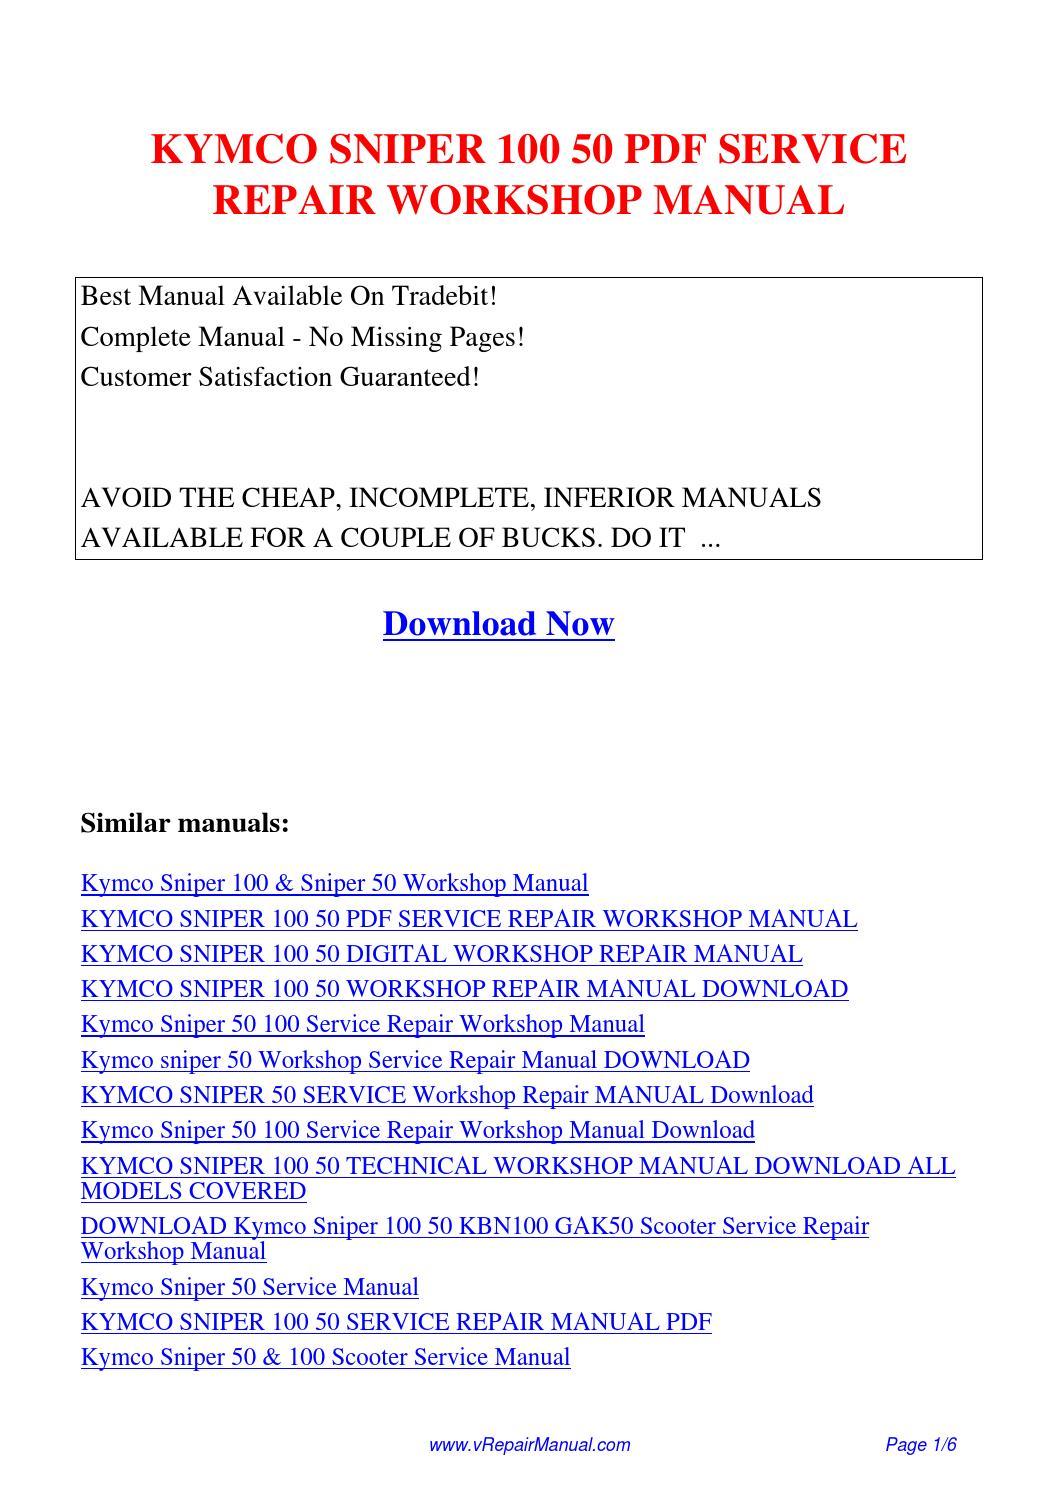 KYMCO SNIPER 100 50 SERVICE REPAIR WORKSHOP MANUAL.pdf by David Zhang -  issuu